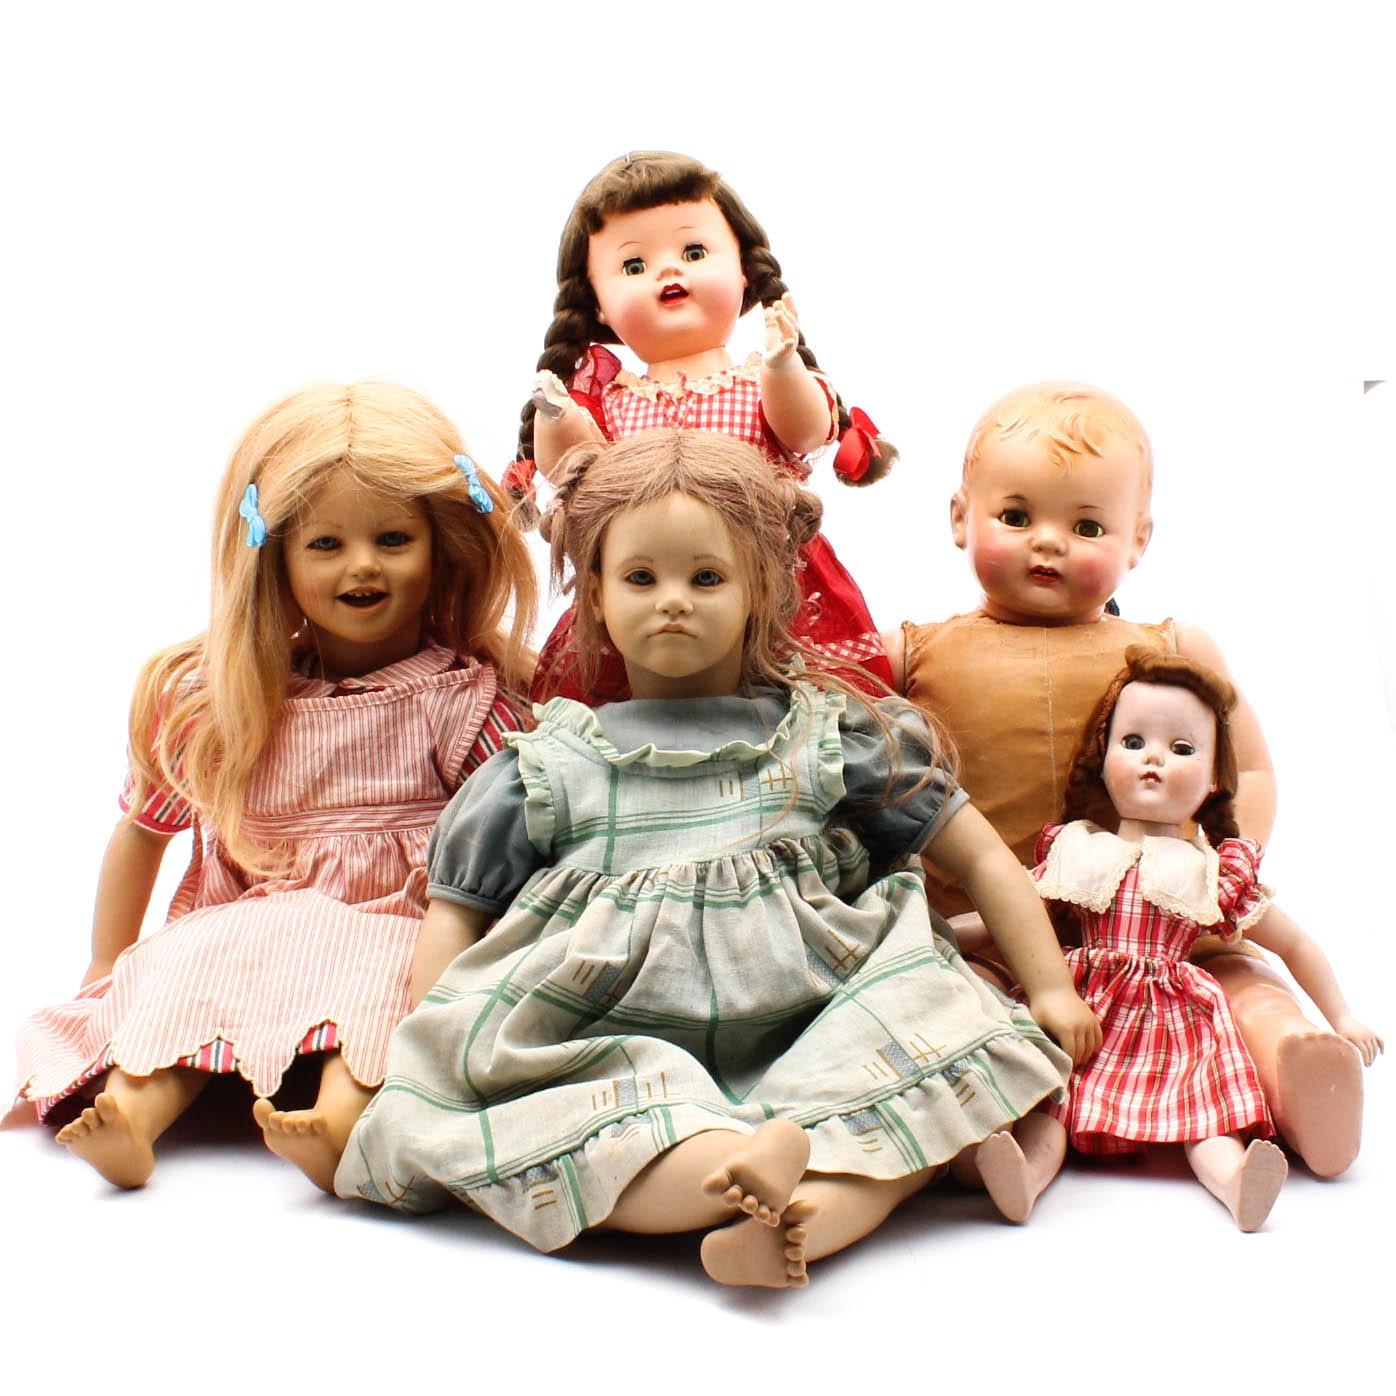 Baby Dolls Including Annette Himstedt, Effanbee